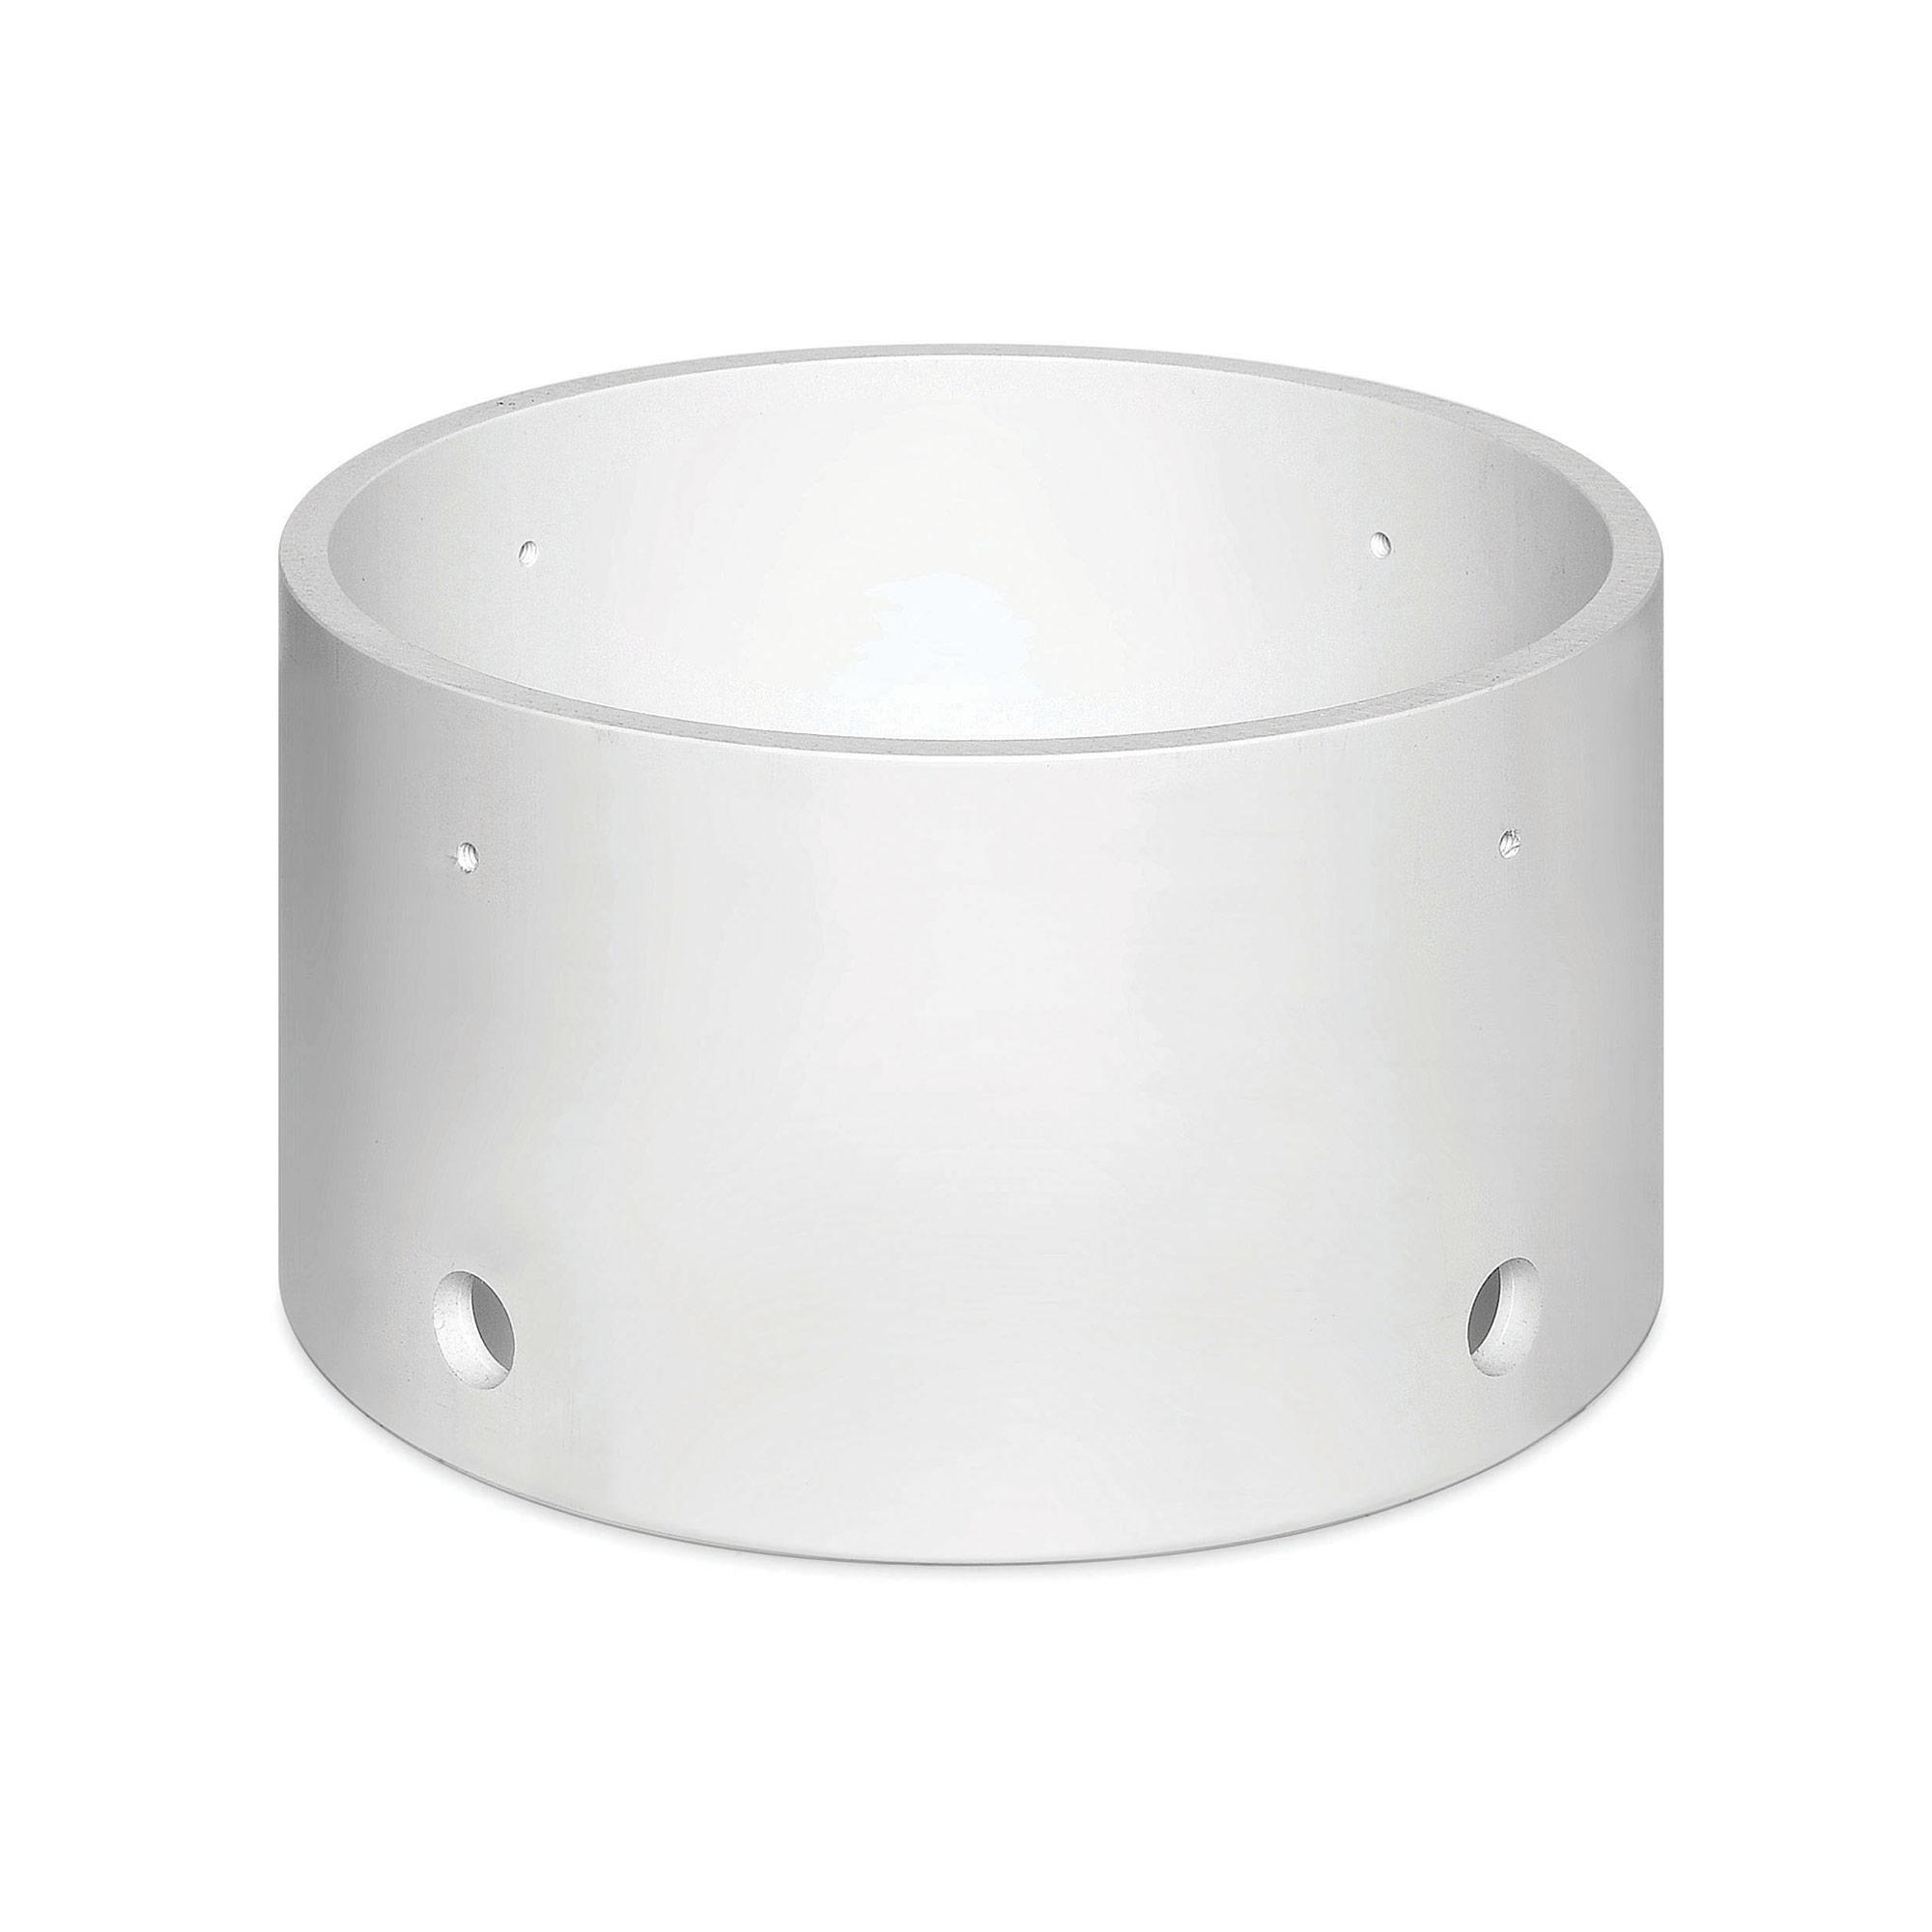 Concrete Kit For Well Lights By Hinkley Lighting